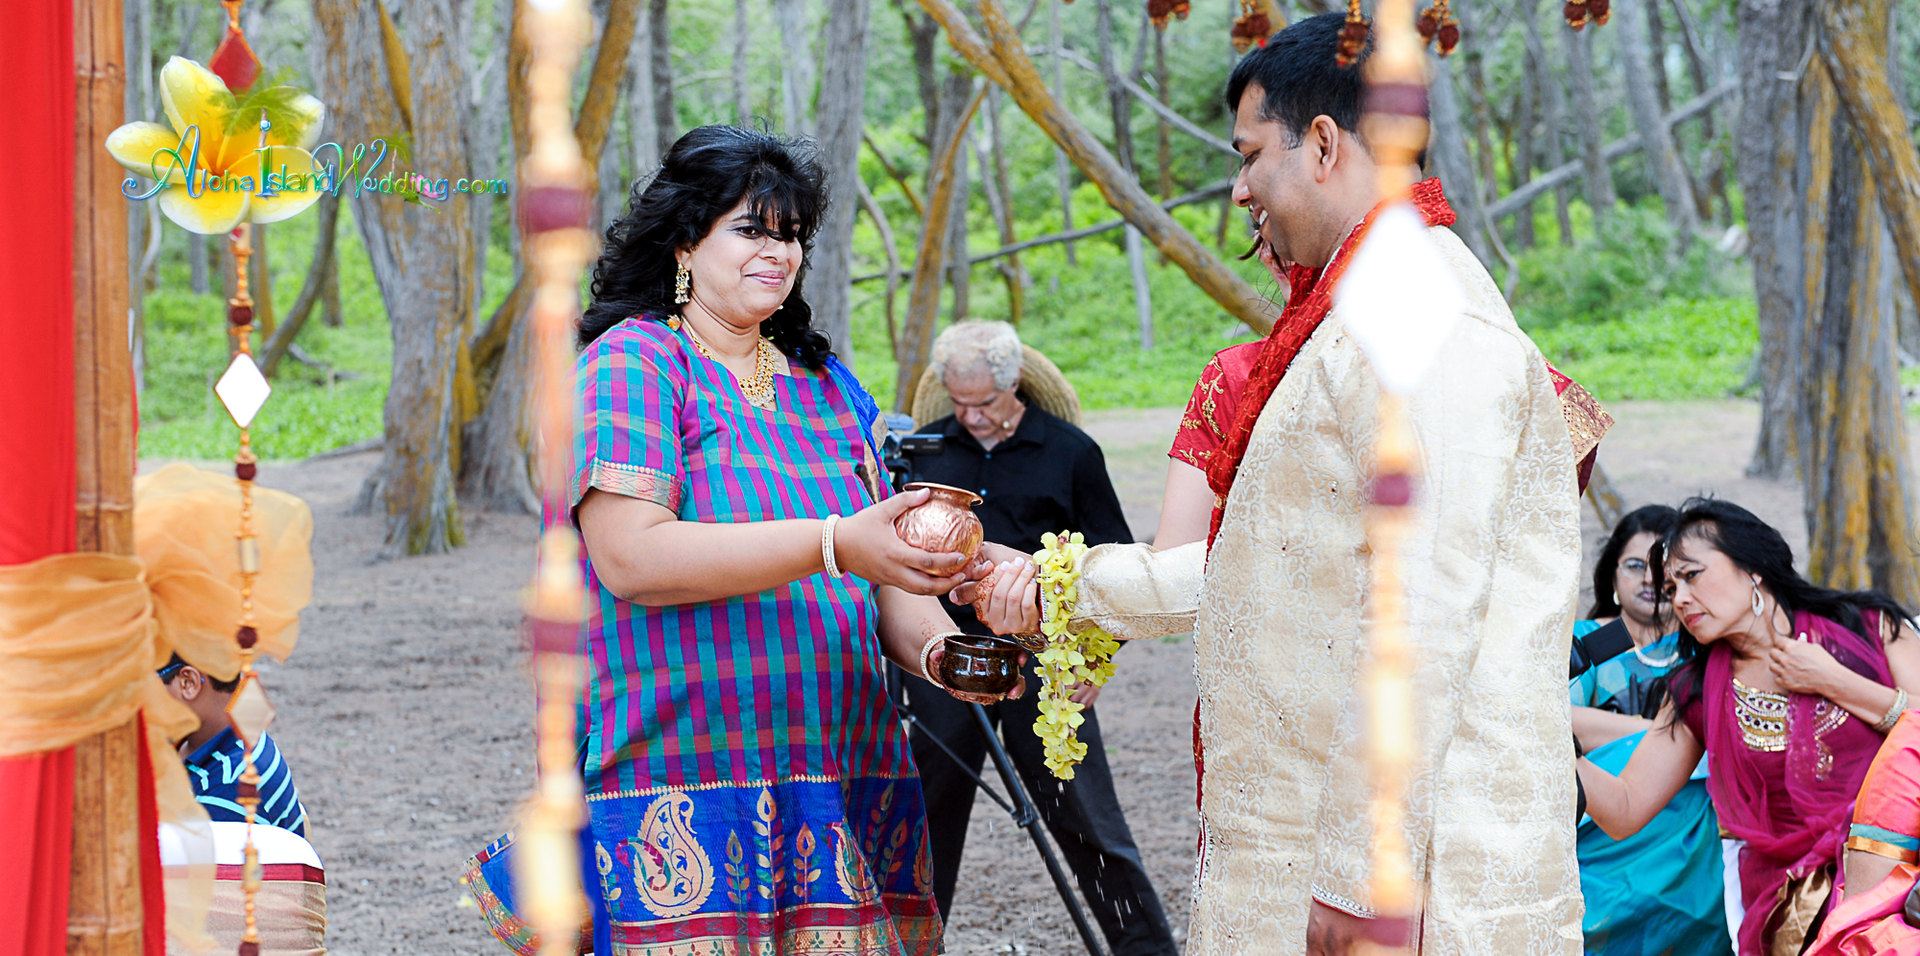 Indian wedding ceremony in hawaii-98.jpg